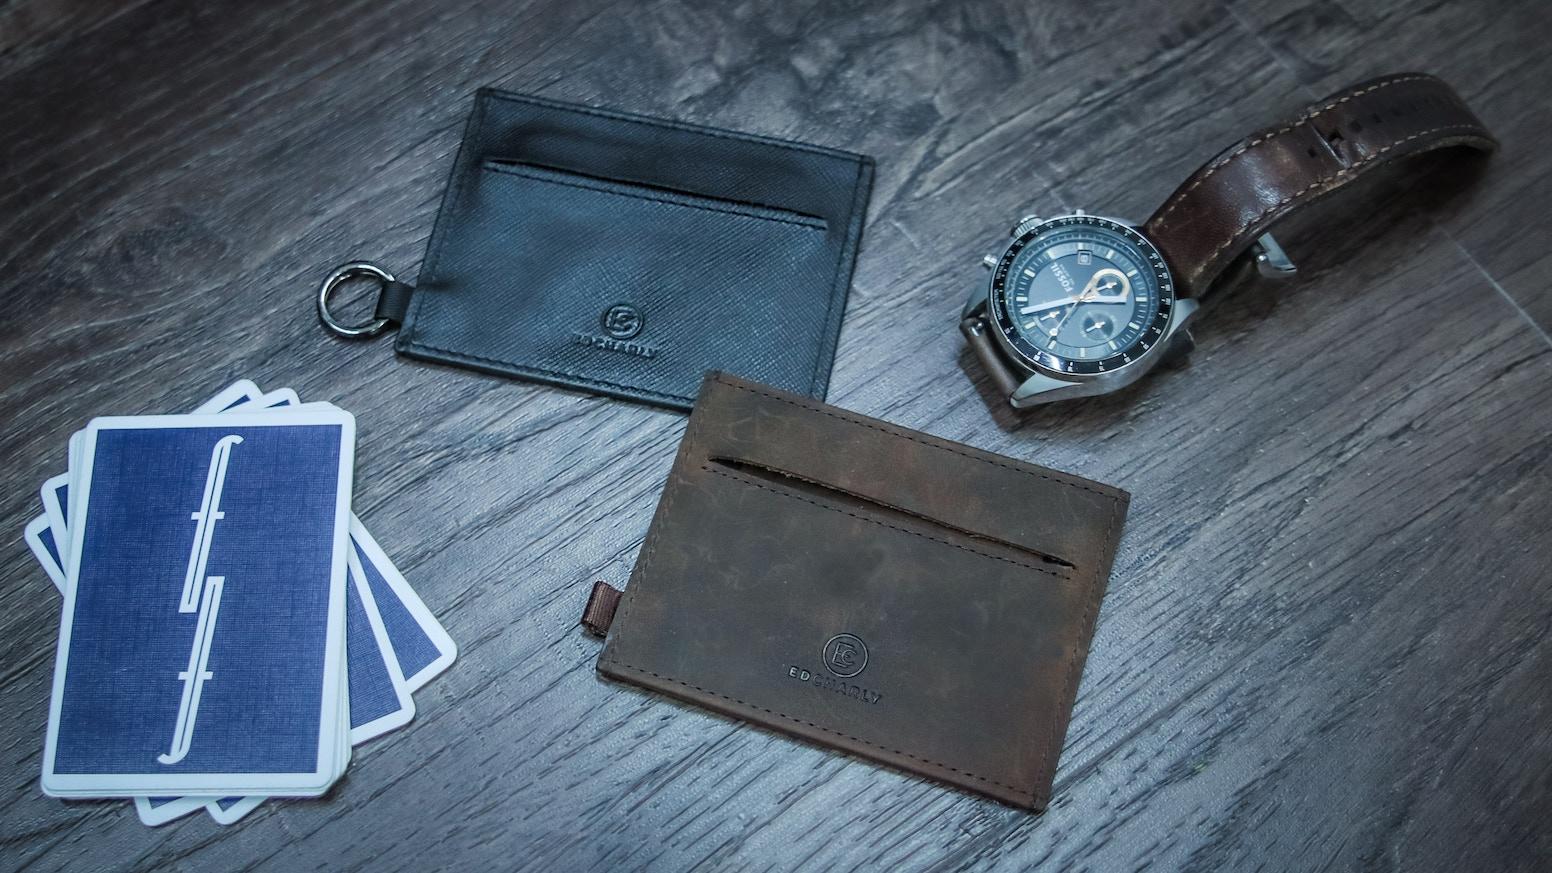 The Ideal Slim Minimalist Wallet By Ed Charly Kickstarter